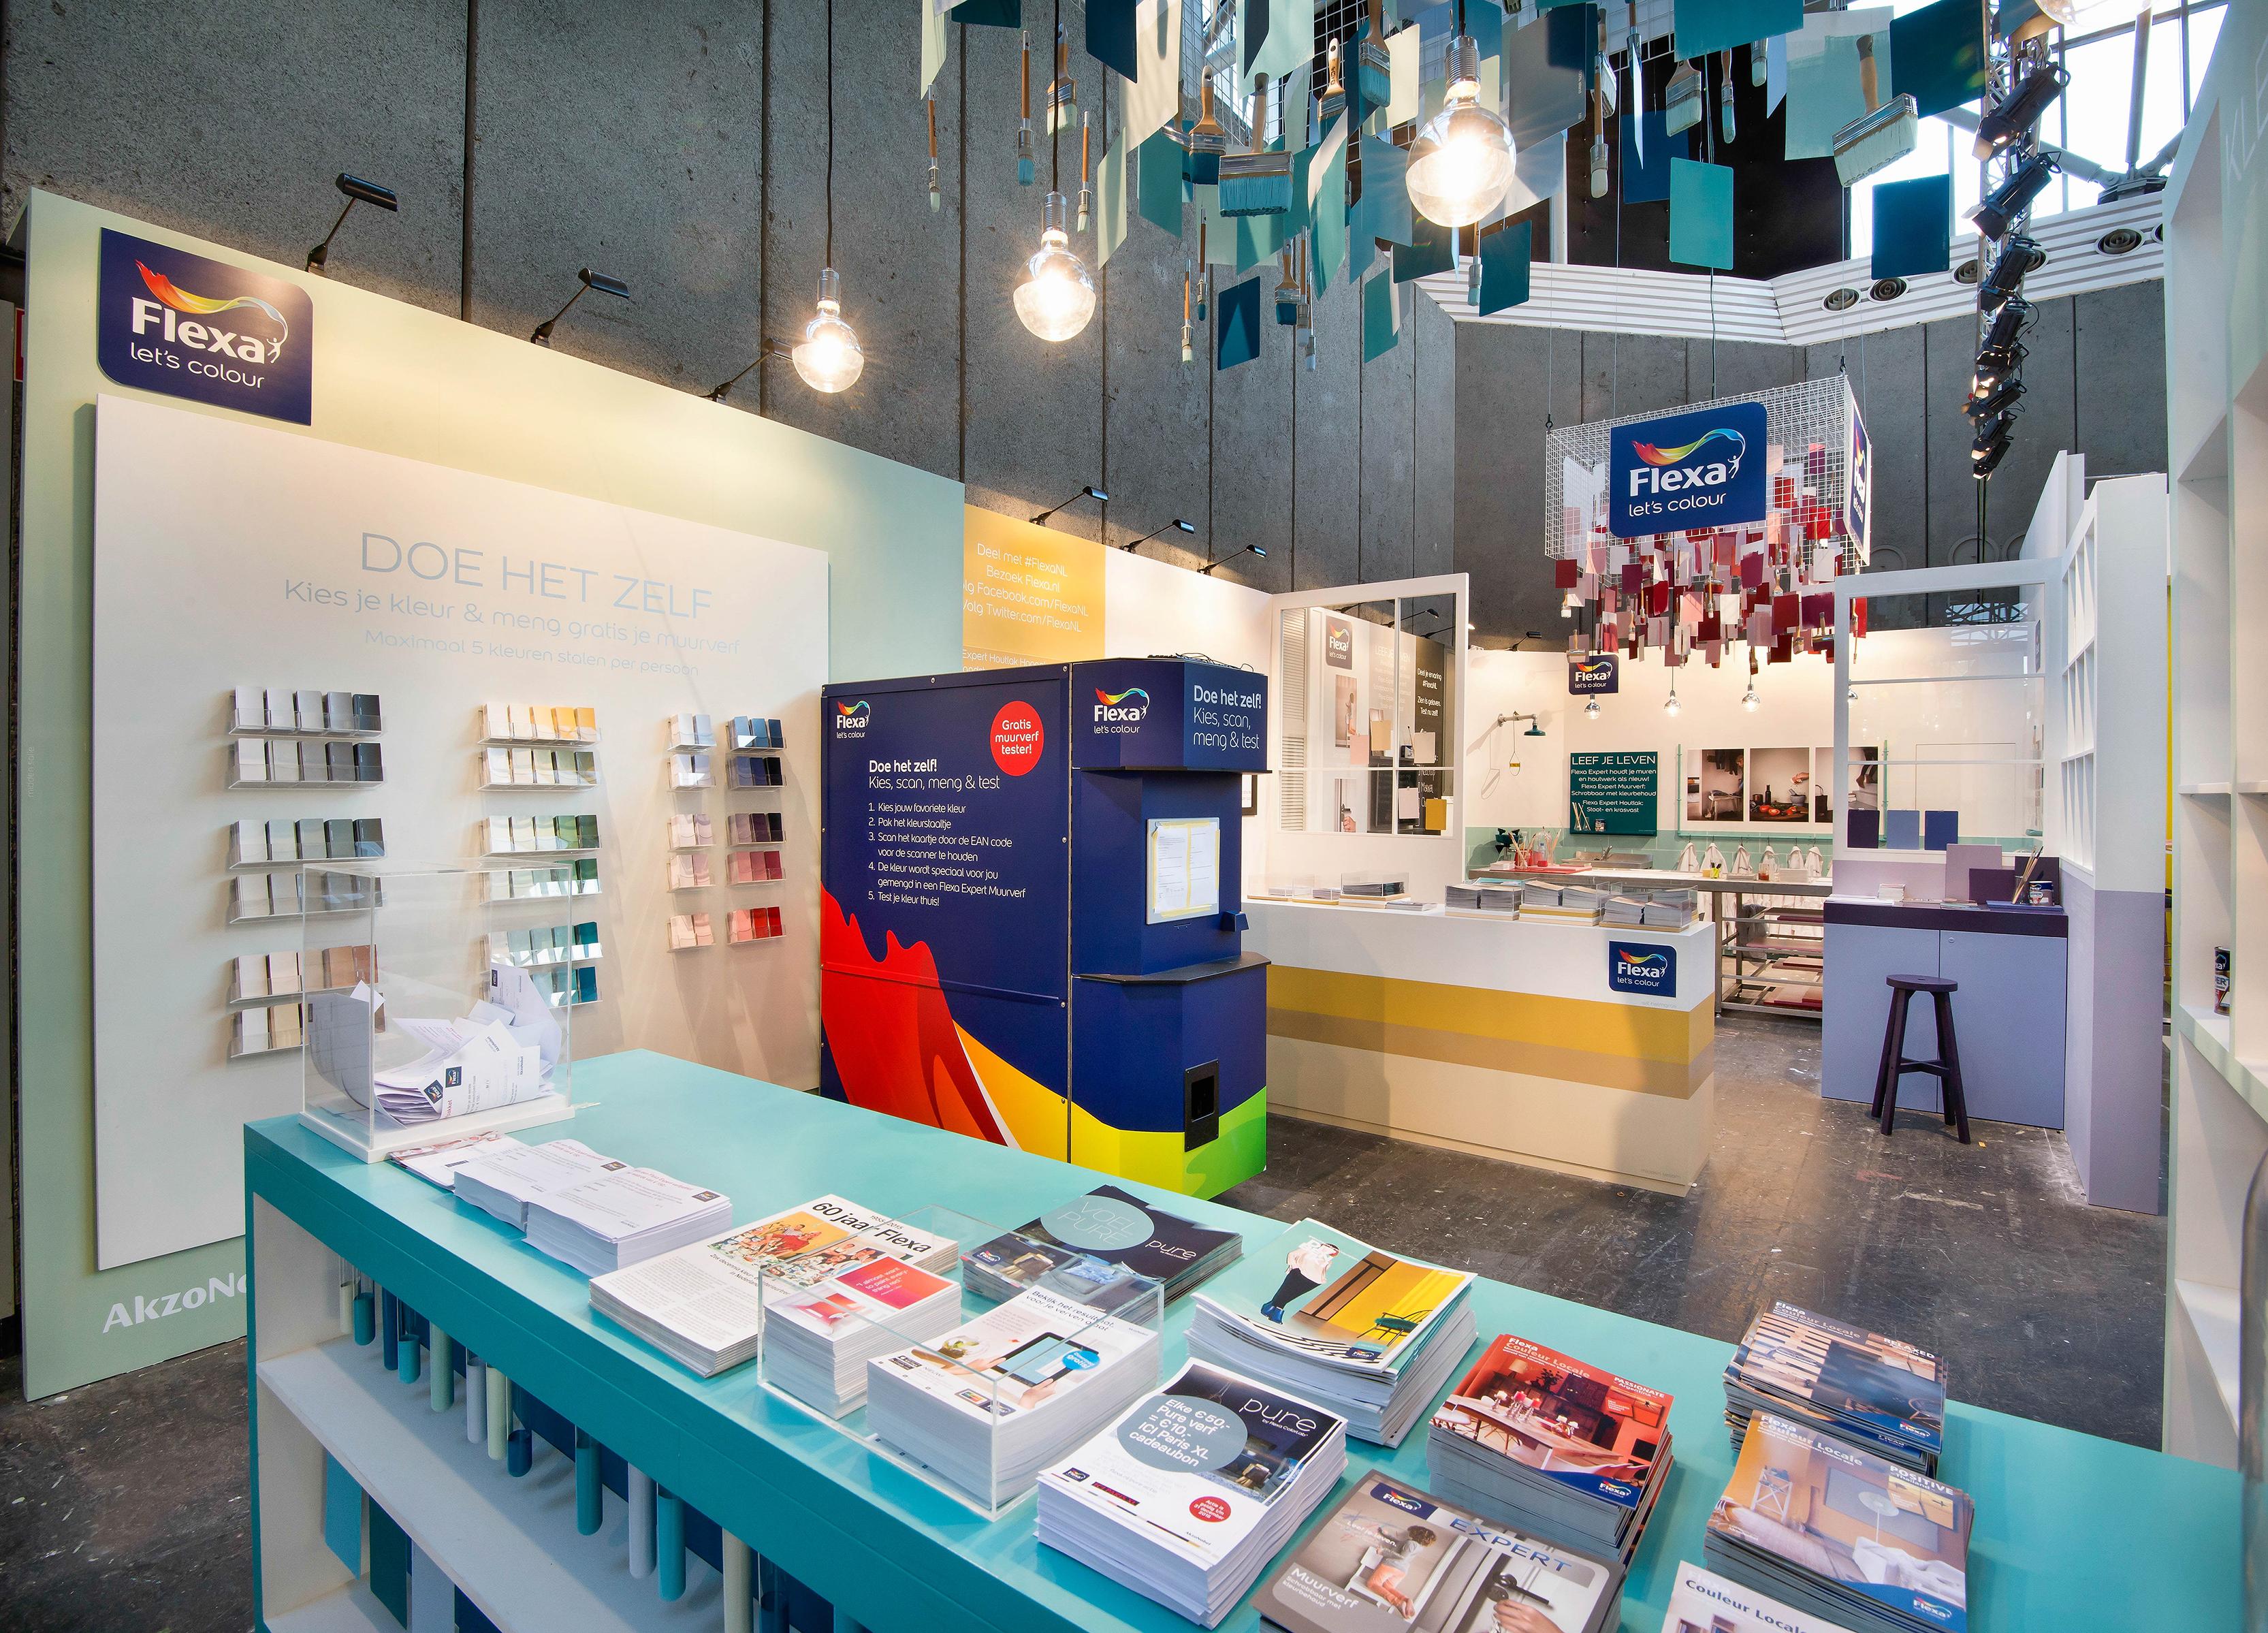 Vt wonen design beurs 2015 for Woonbeurs 2016 utrecht